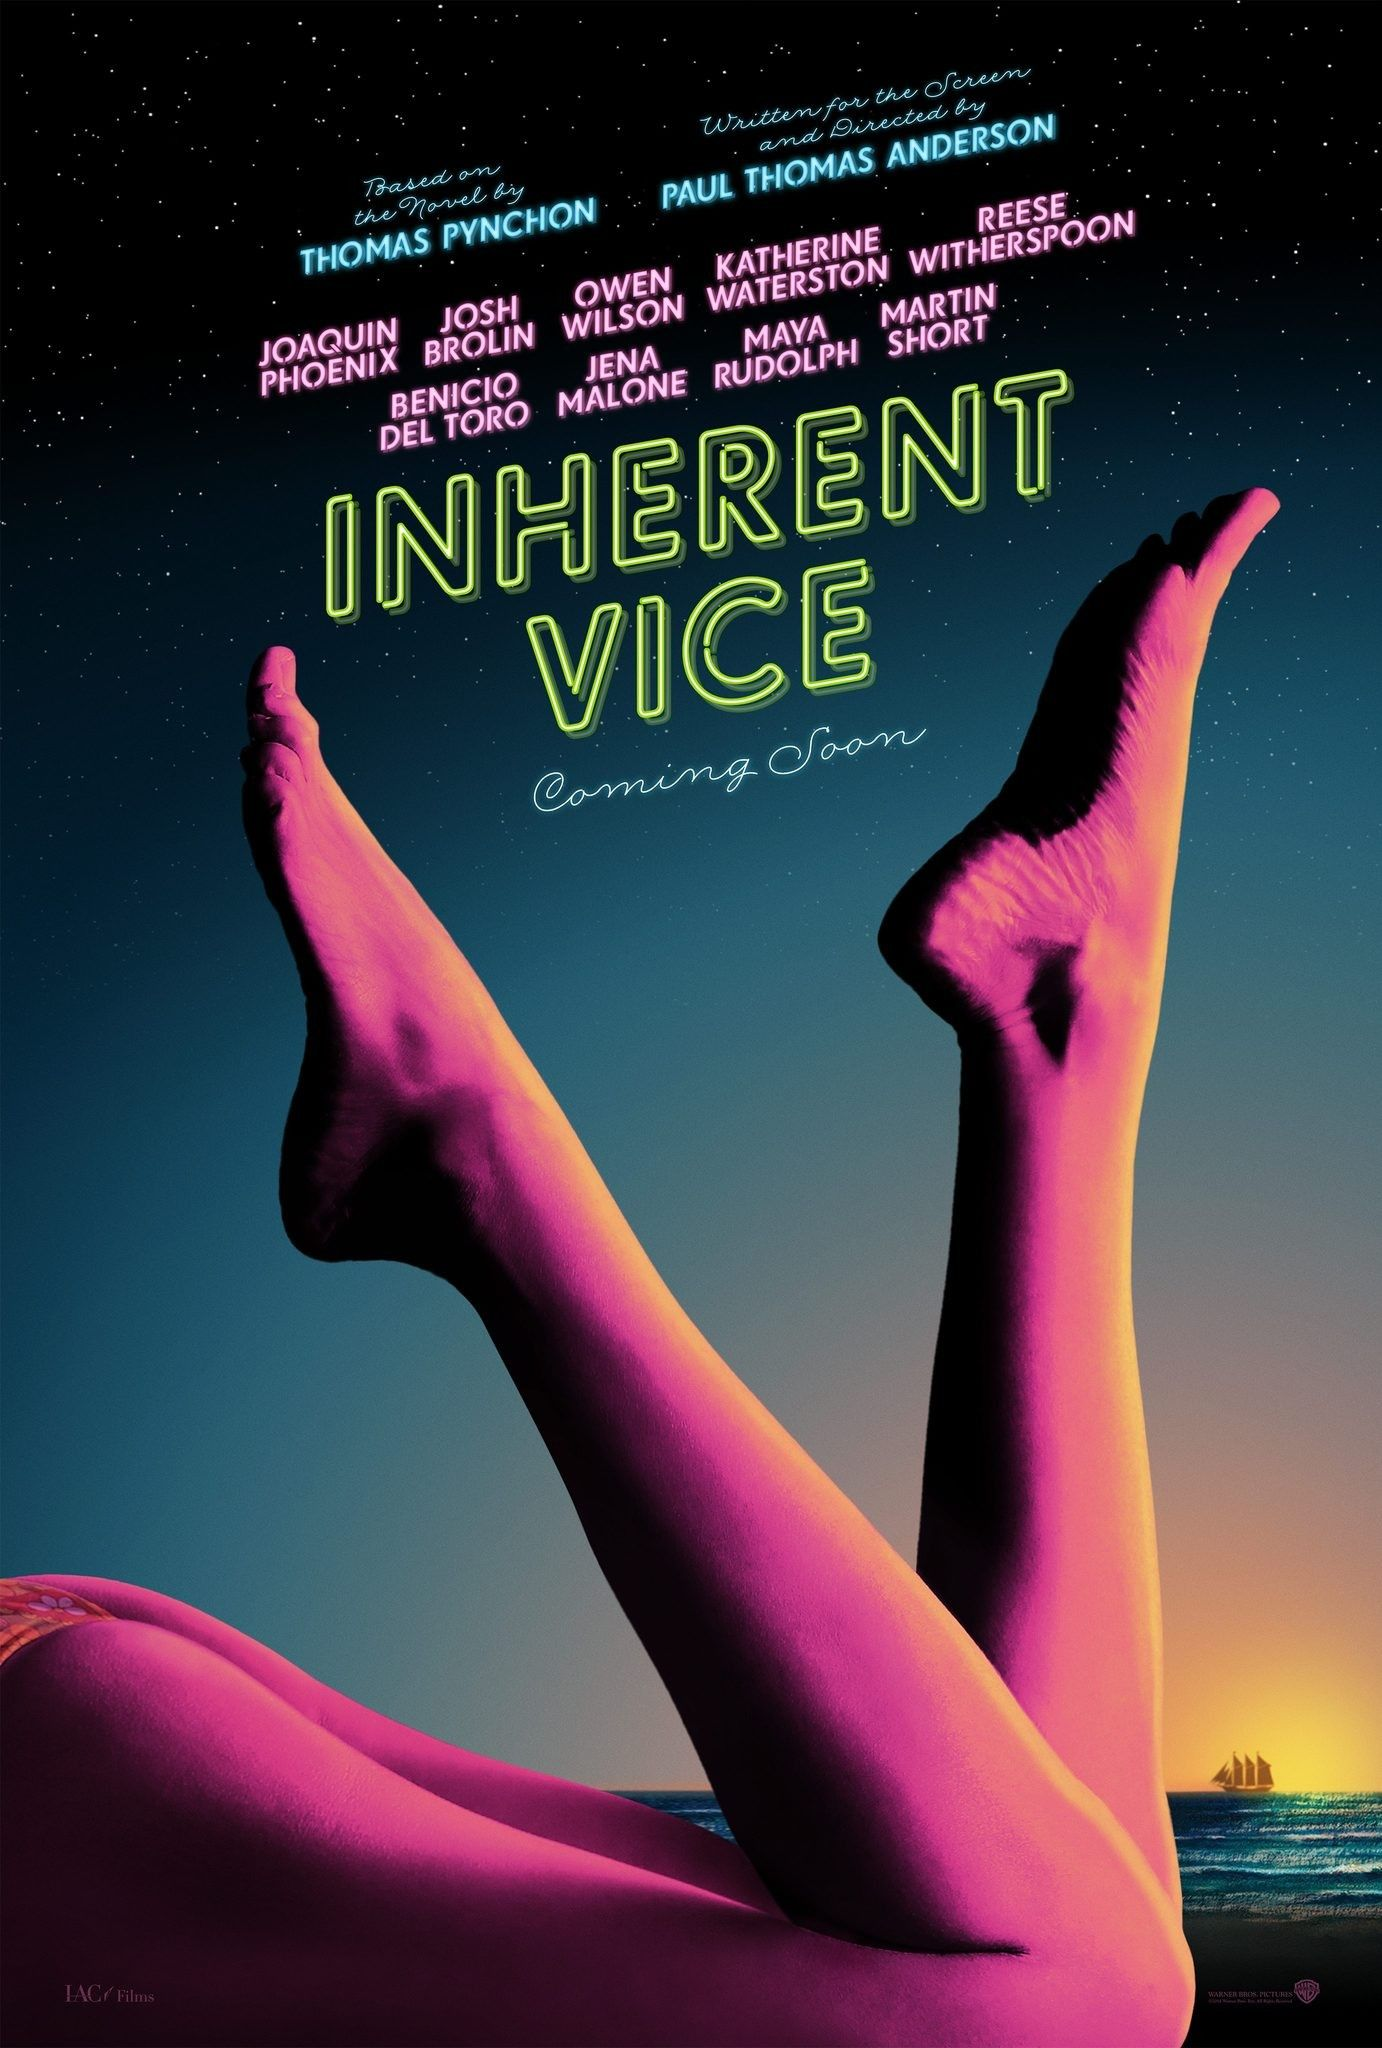 Inerente Good vício inerente (inherent vice - 2015) | 2 0 1 6 | pinterest